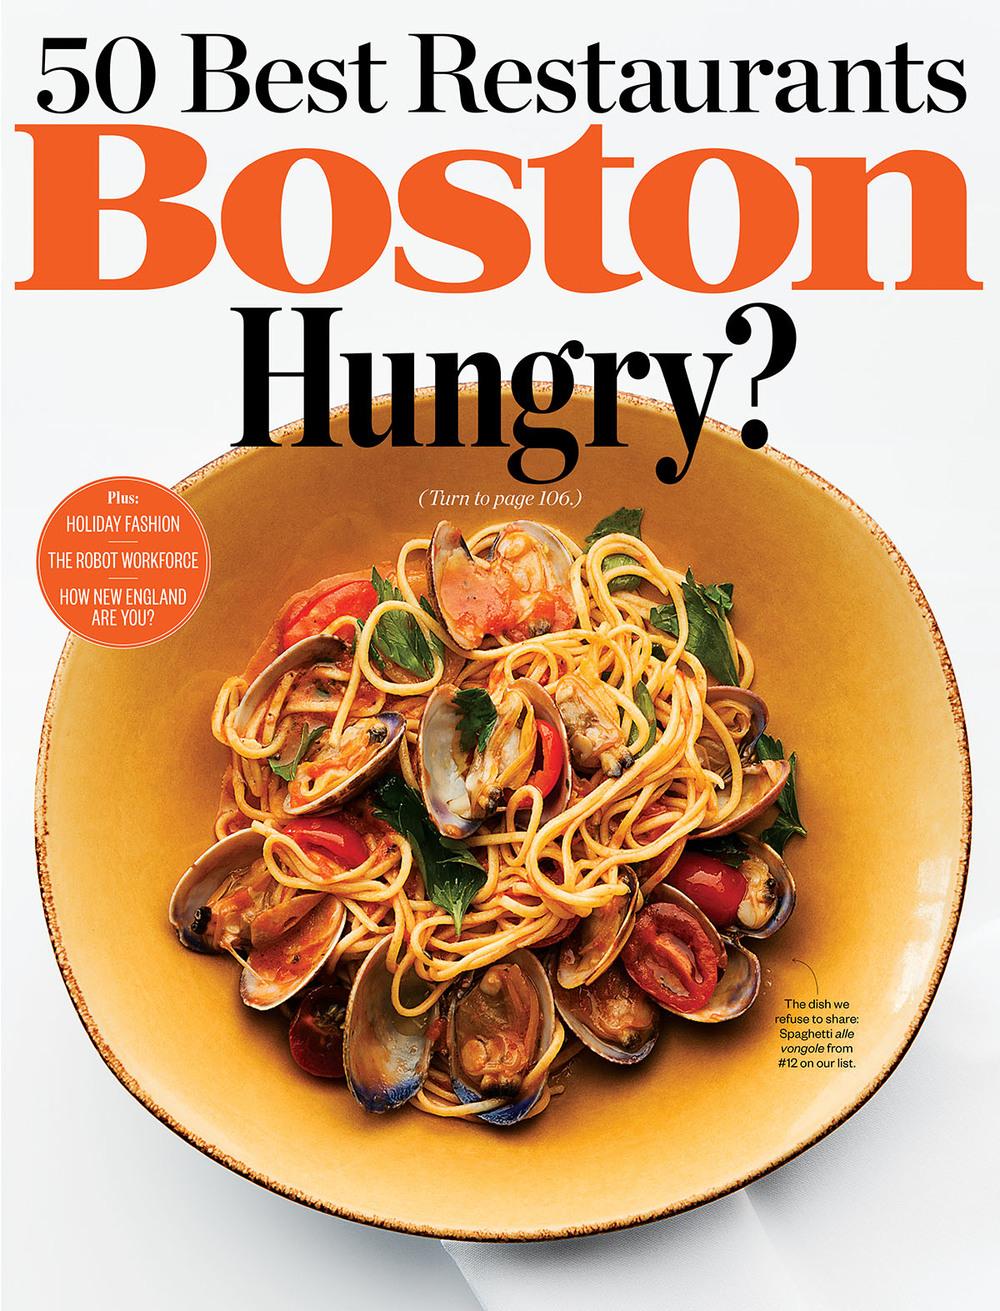 BOSTON MAGAZINE The 50 Best Restaurants of 2014 NOVEMBER 2014